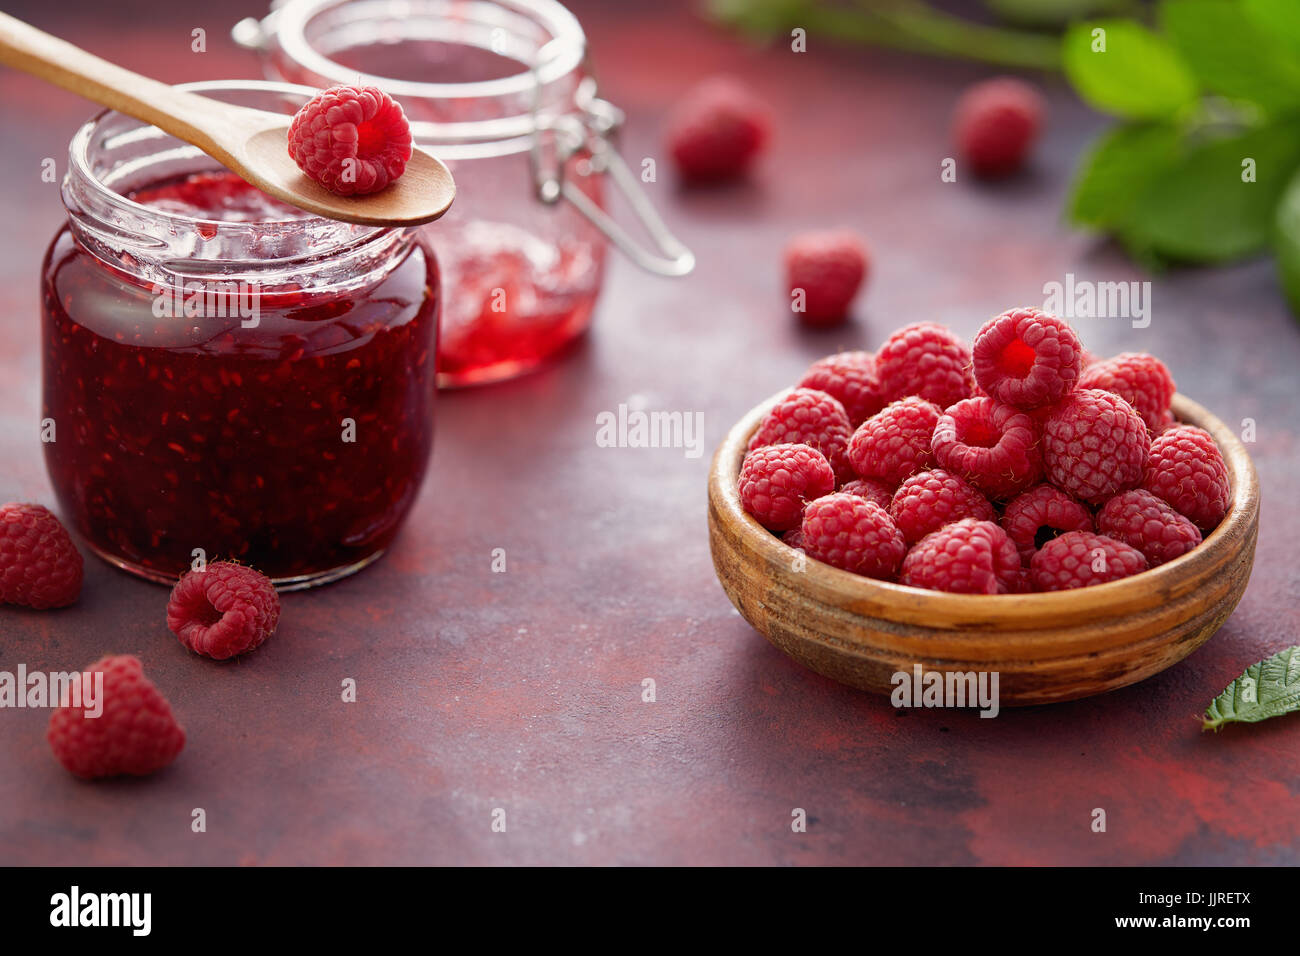 Fresh raspberries and a jar of raspberry jam. - Stock Image